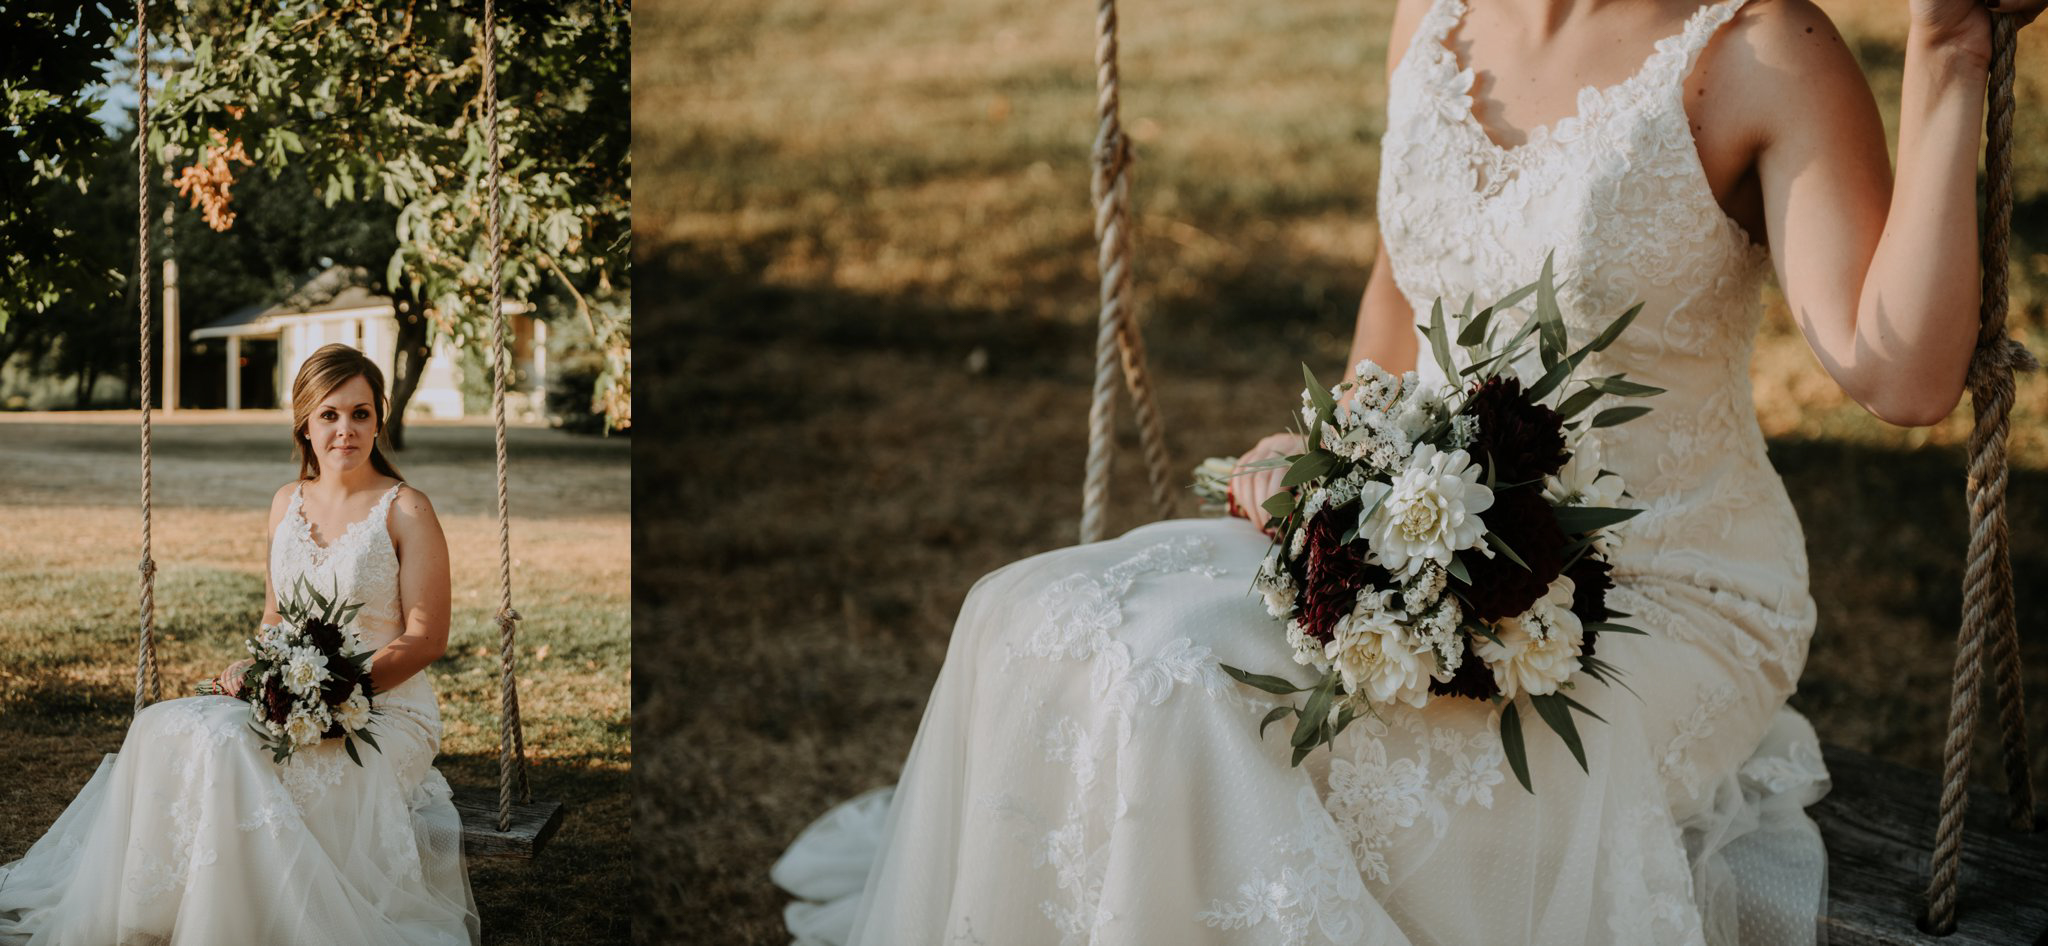 kristen-and-cody-the-kelley-farm-wedding-seattle-photographer-caitlyn-nikula-88.jpg